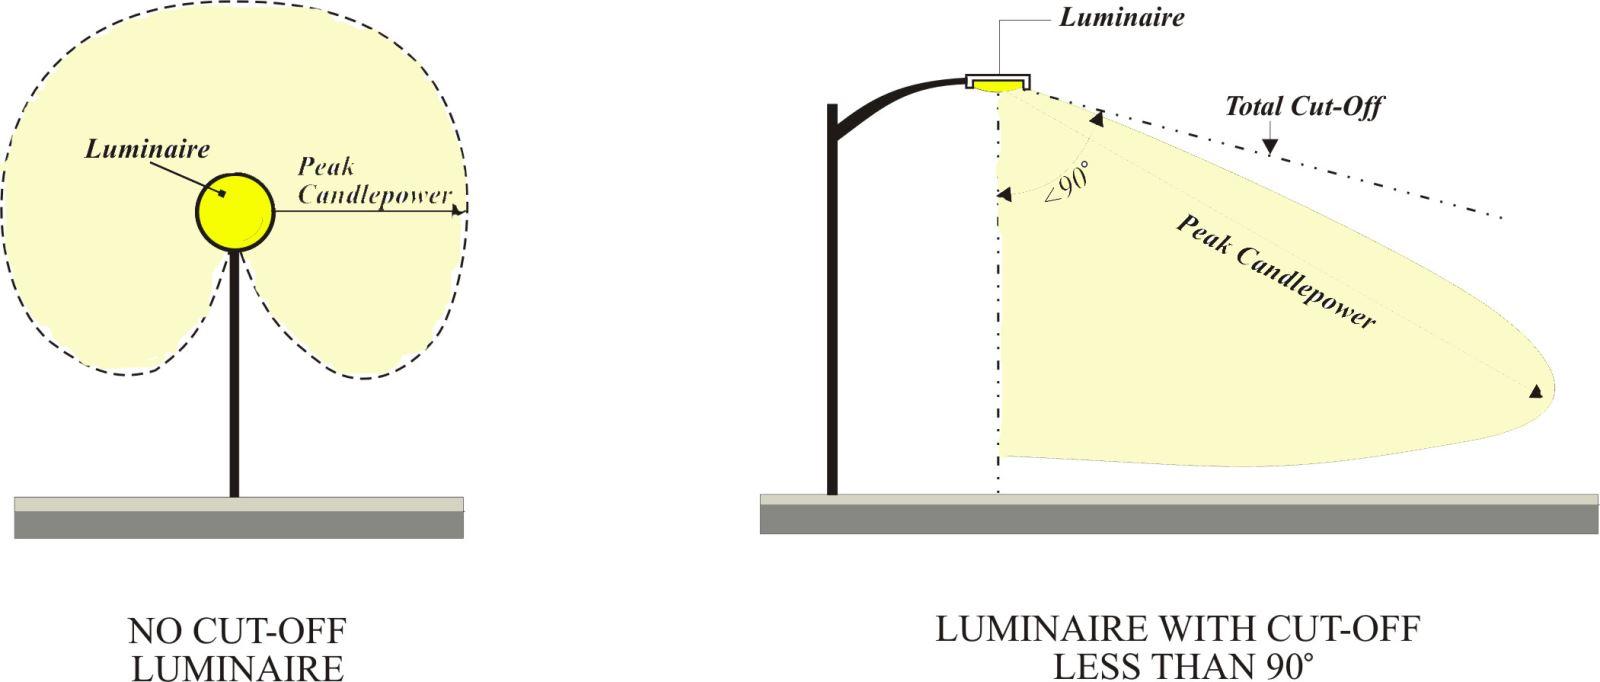 Unified Development Ordinance Document Viewer Exterior Wiring Regulations